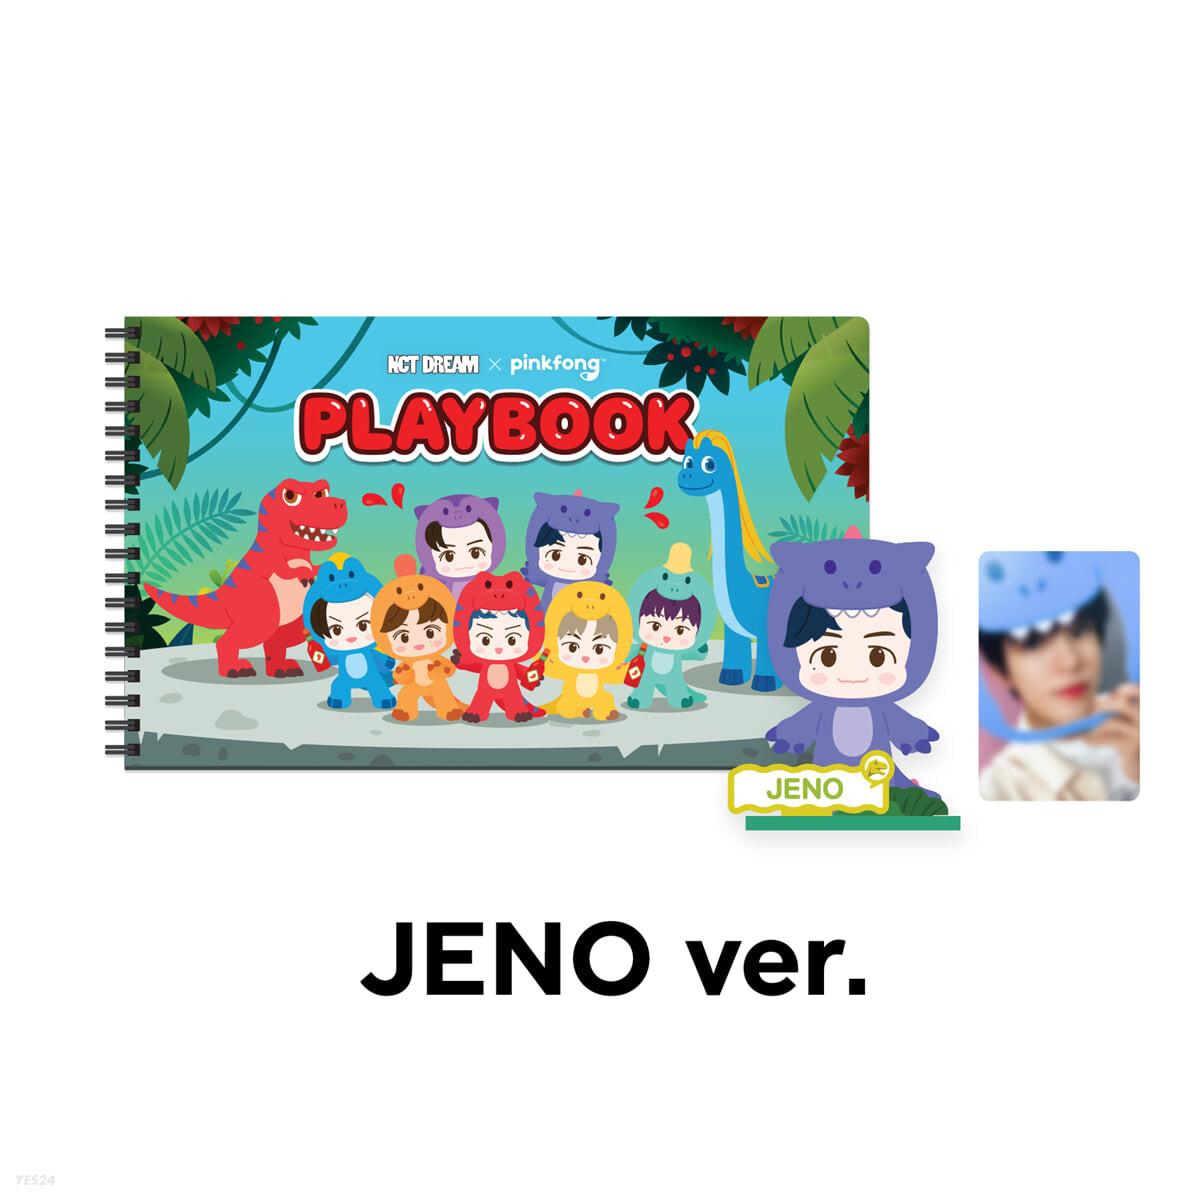 [JENO] PLAYBOOK SET - NCT DREAM X PINKFONG